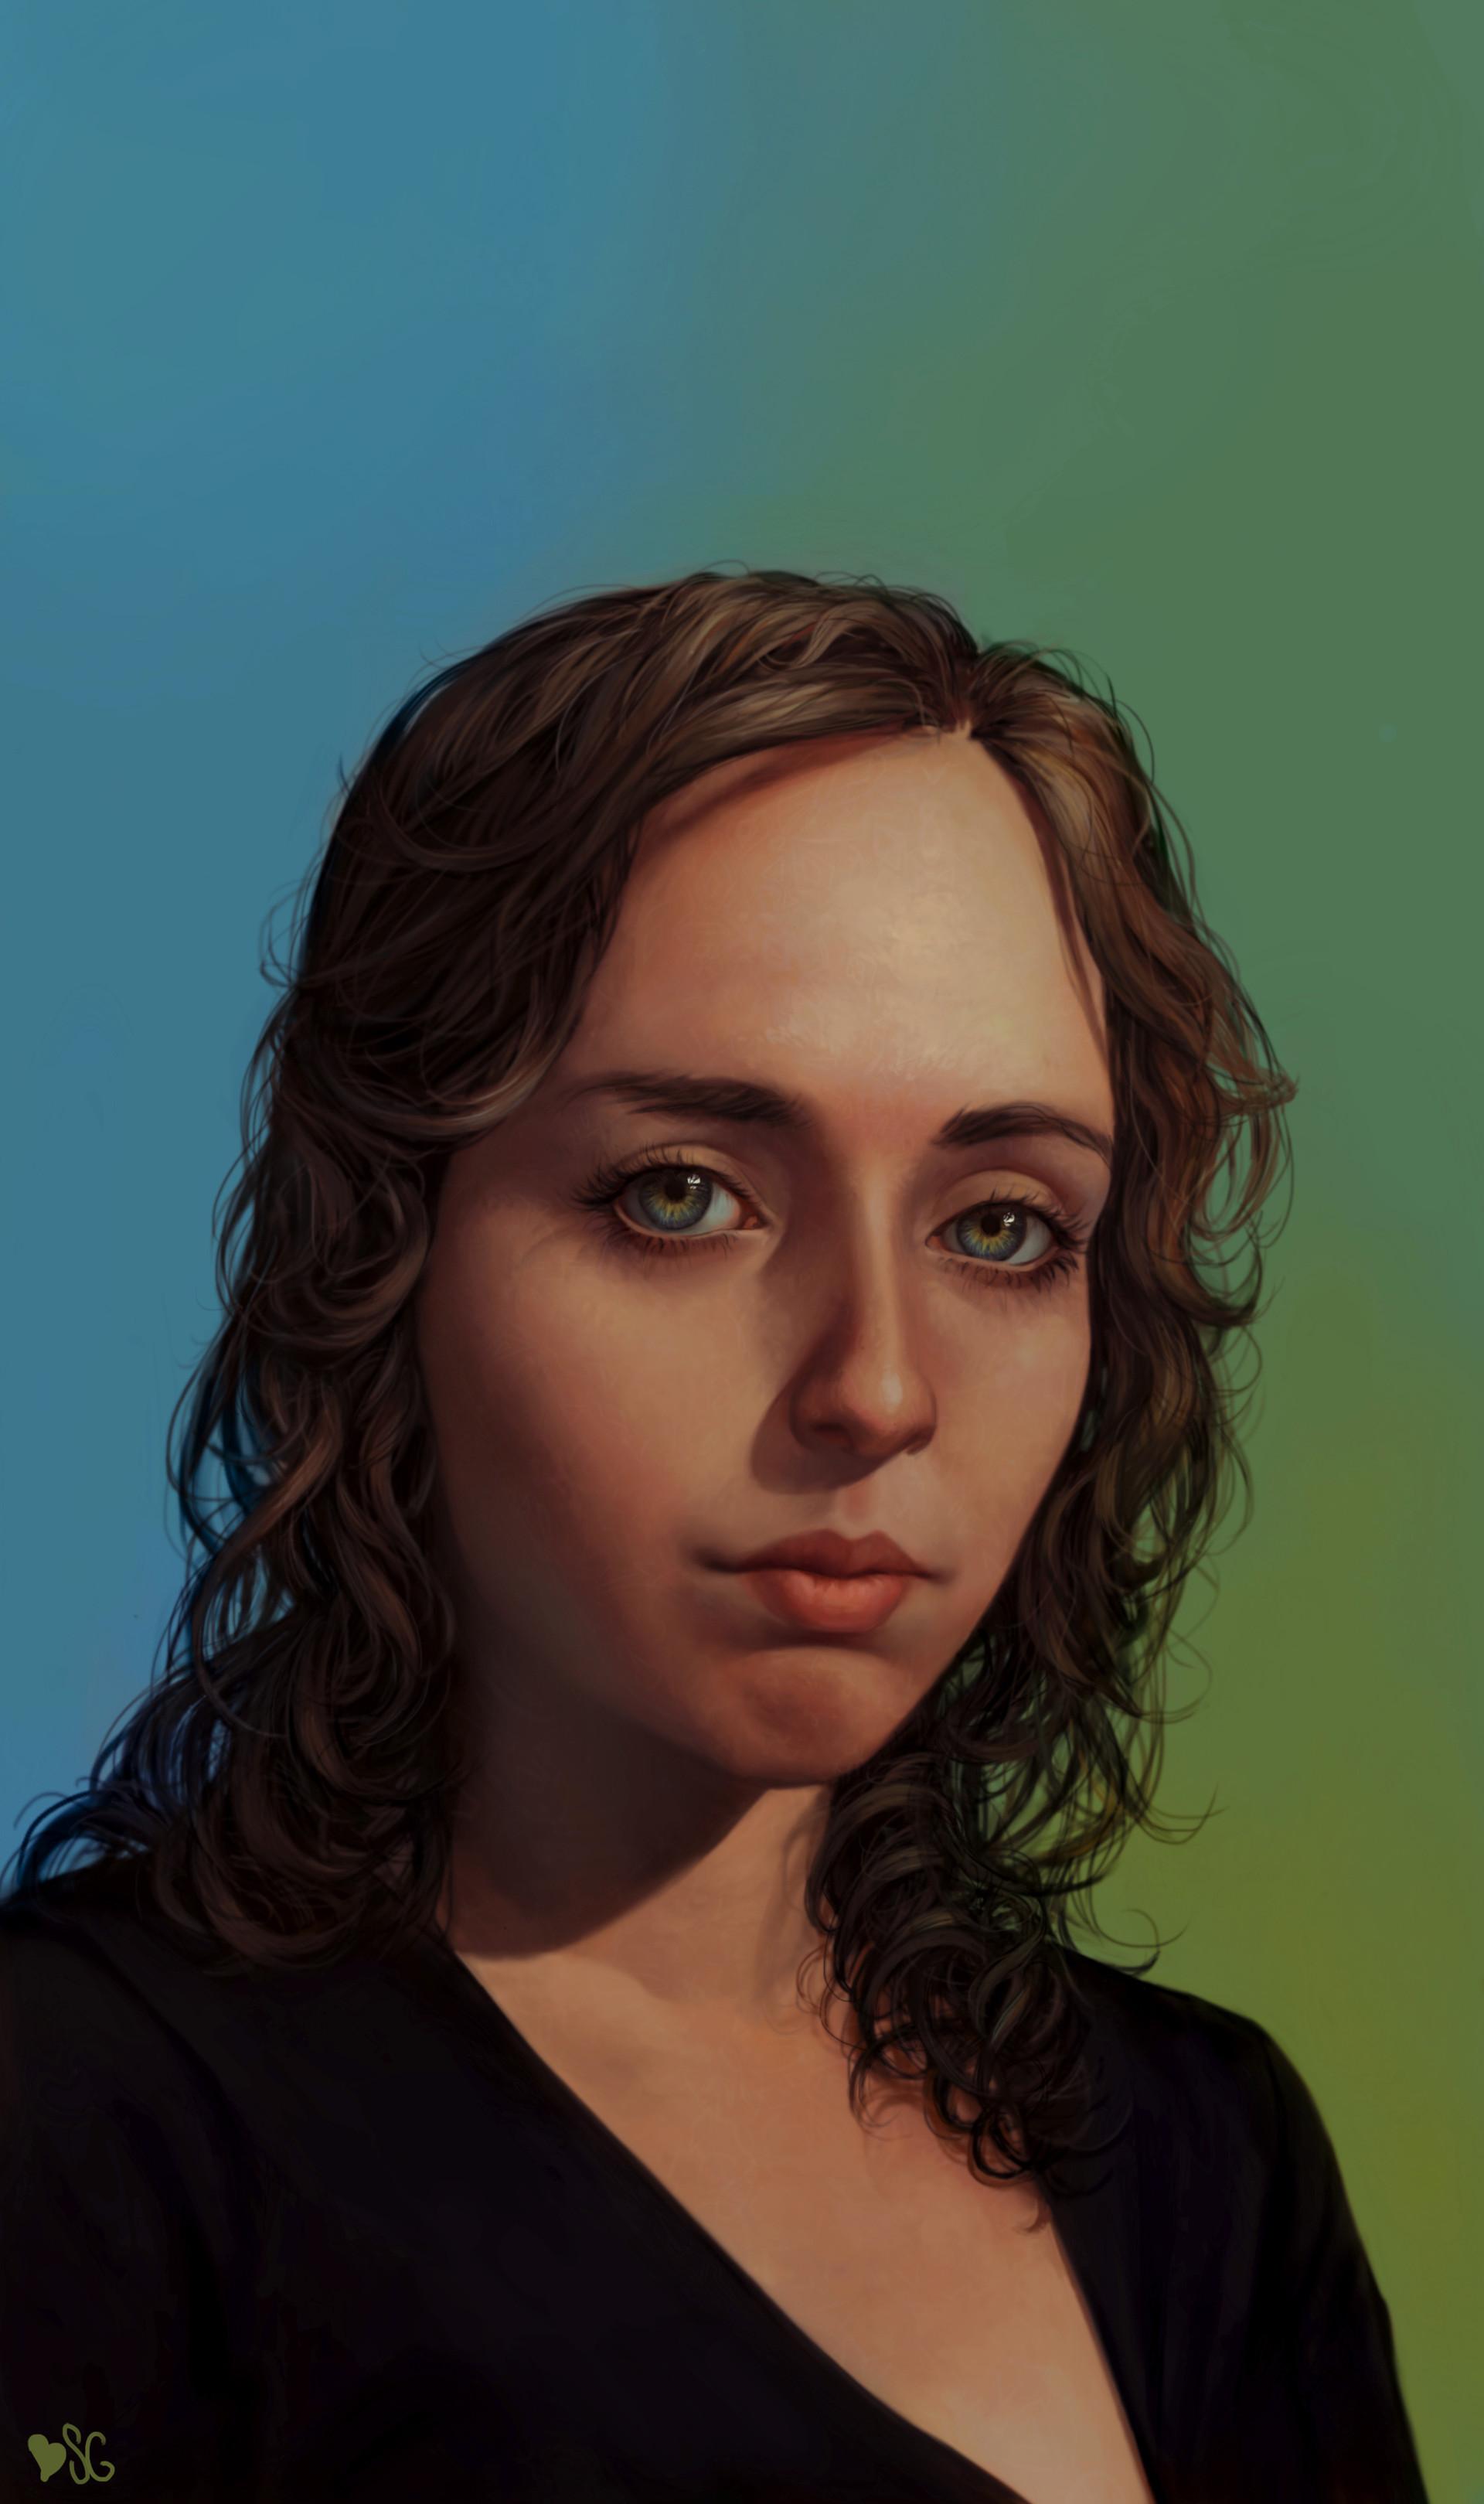 Stephany green sgportrait2016edit